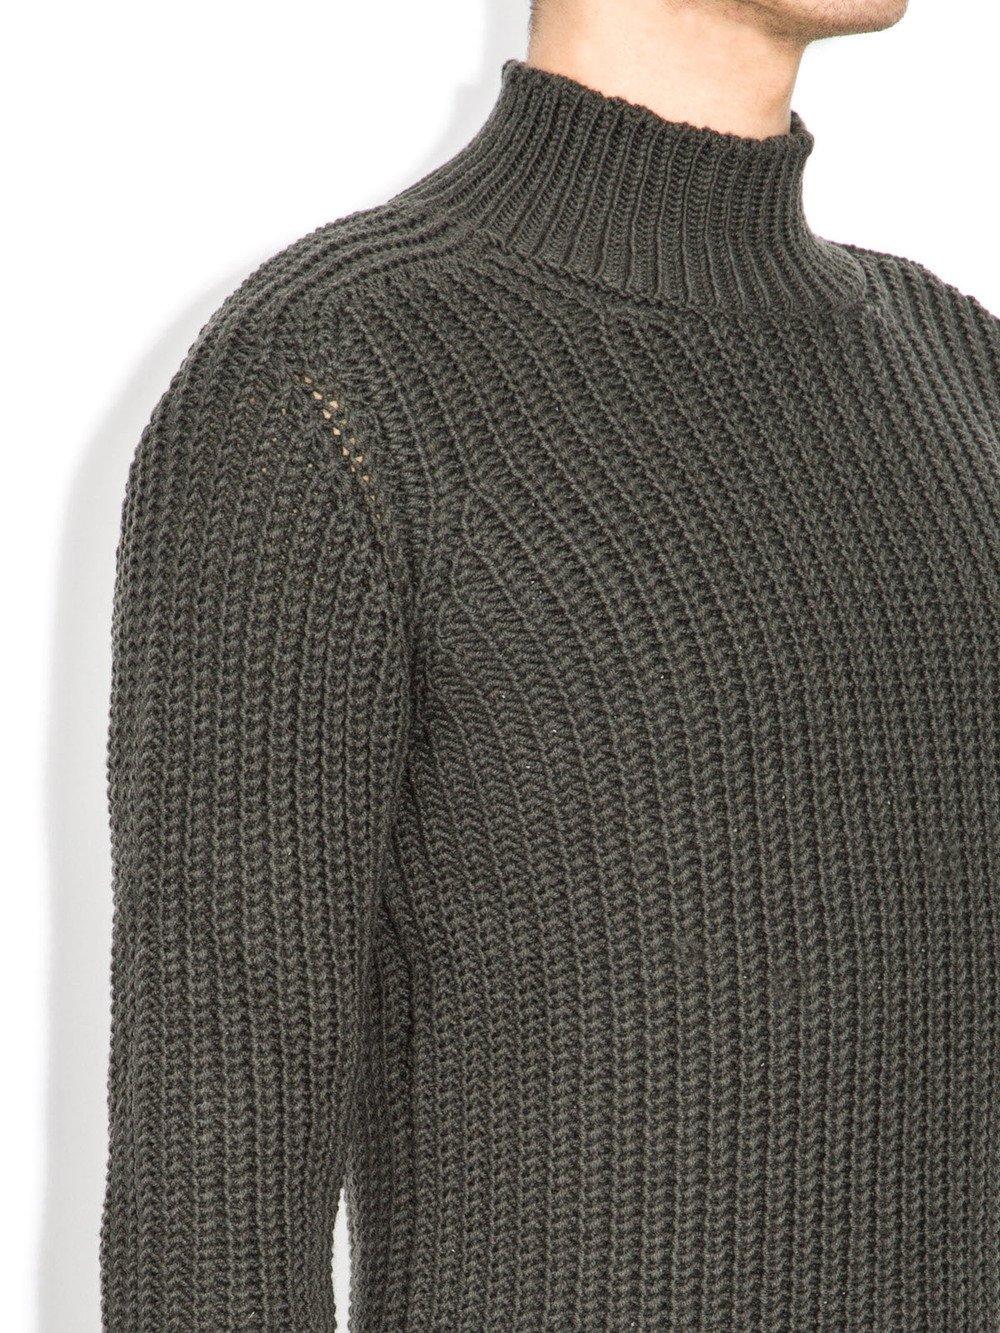 rick owens fw14 sweater